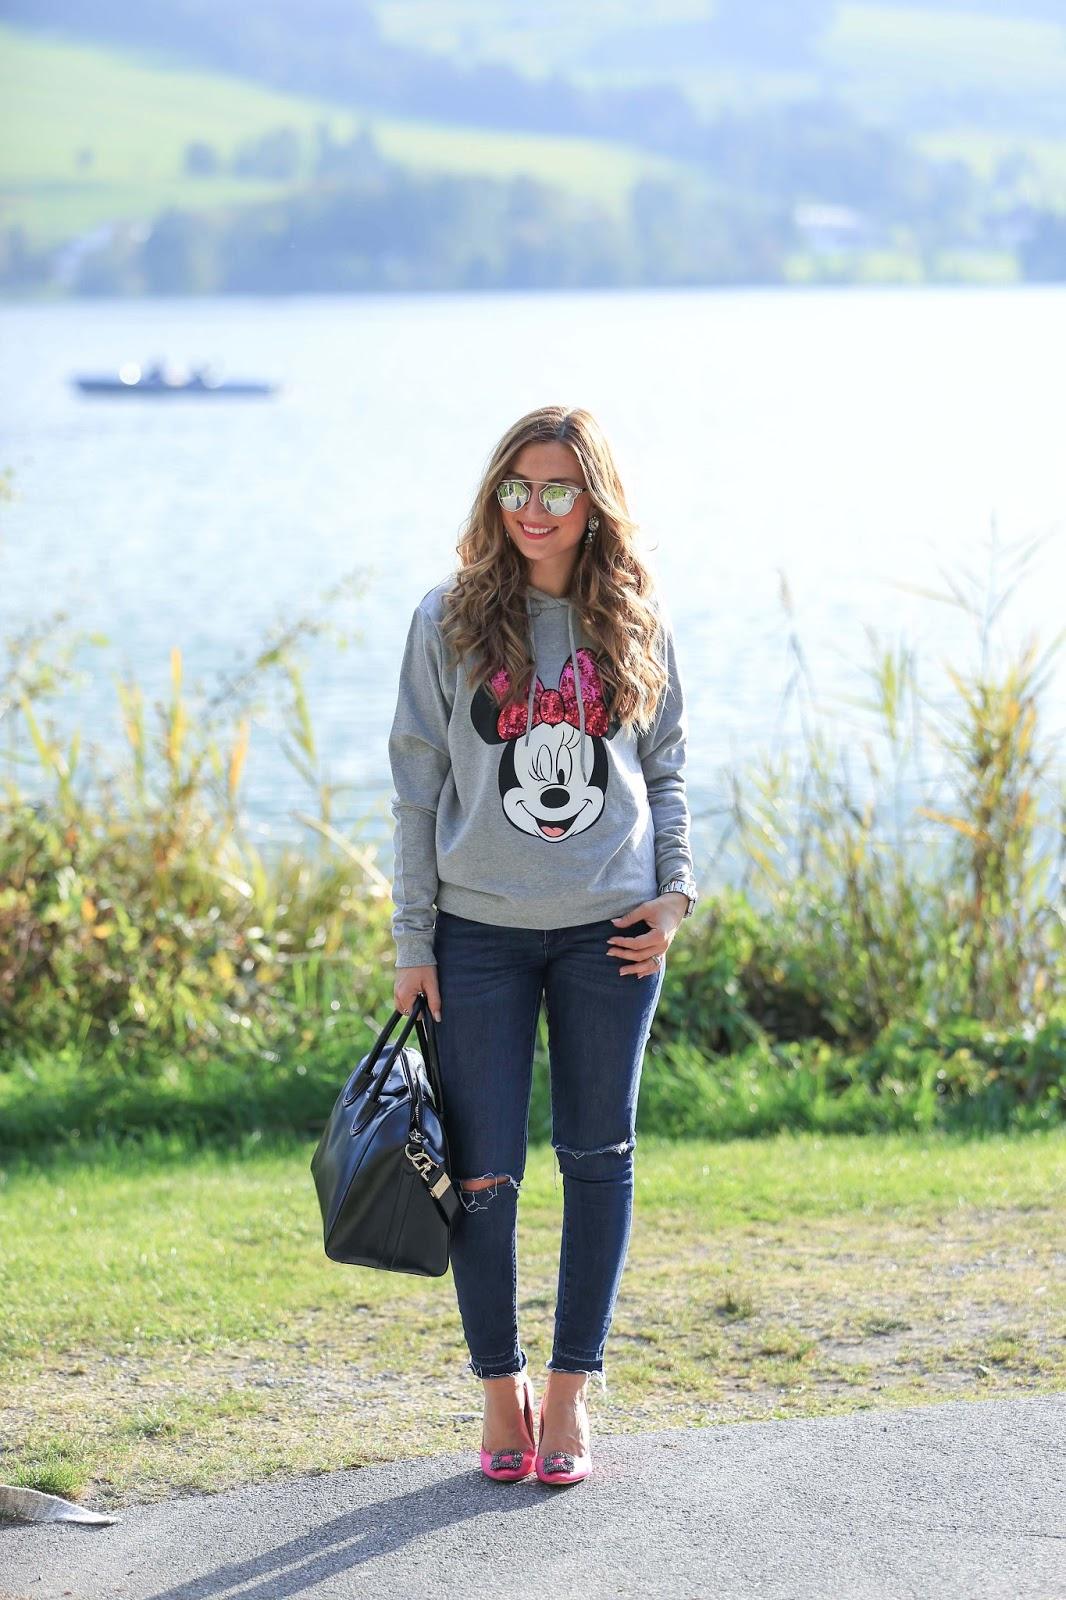 Deutsche Fashionblogger-Blogger aus Frankfurt-Frankfurt Fashionblogger-Fashionstylebyjohanna-Blogger-Blogger aus Deutschland-Olivia Palermo Style- Pinke Schuhe-Schwarze Bowlingtasche